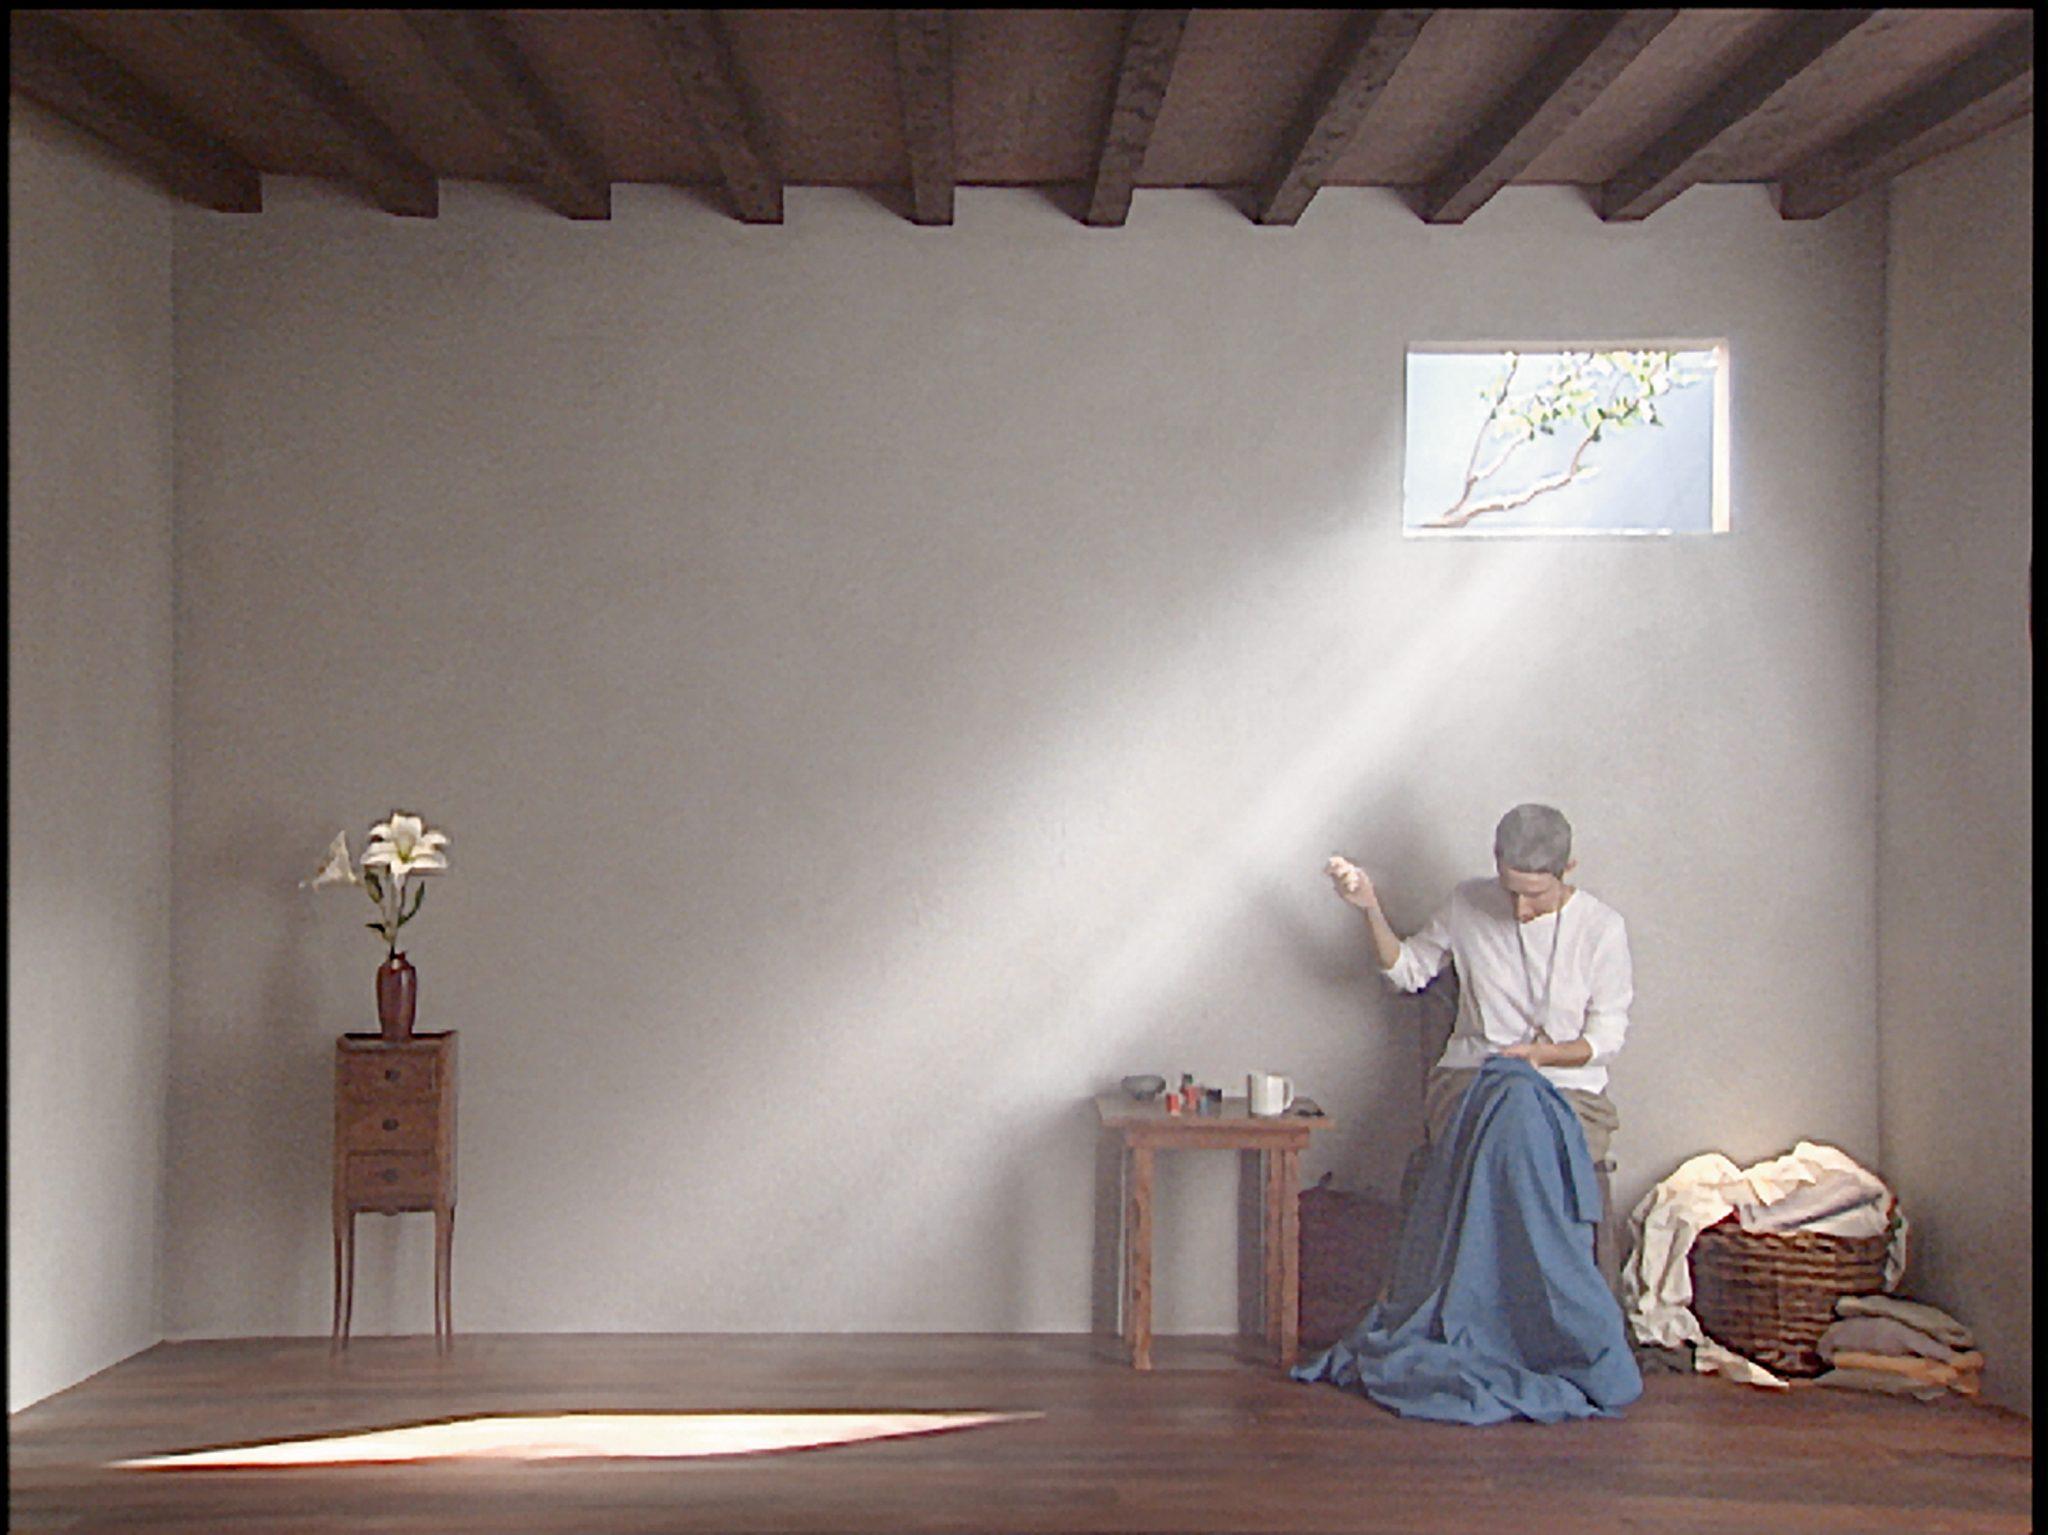 Catherine's Room, 2001  Color video polyptych on five flat panel  displays  18:39 minutes  Performer: Weba Garretson  Courtesy Bill Viola Studio  © Bill Viola  Photo: Kira Perov